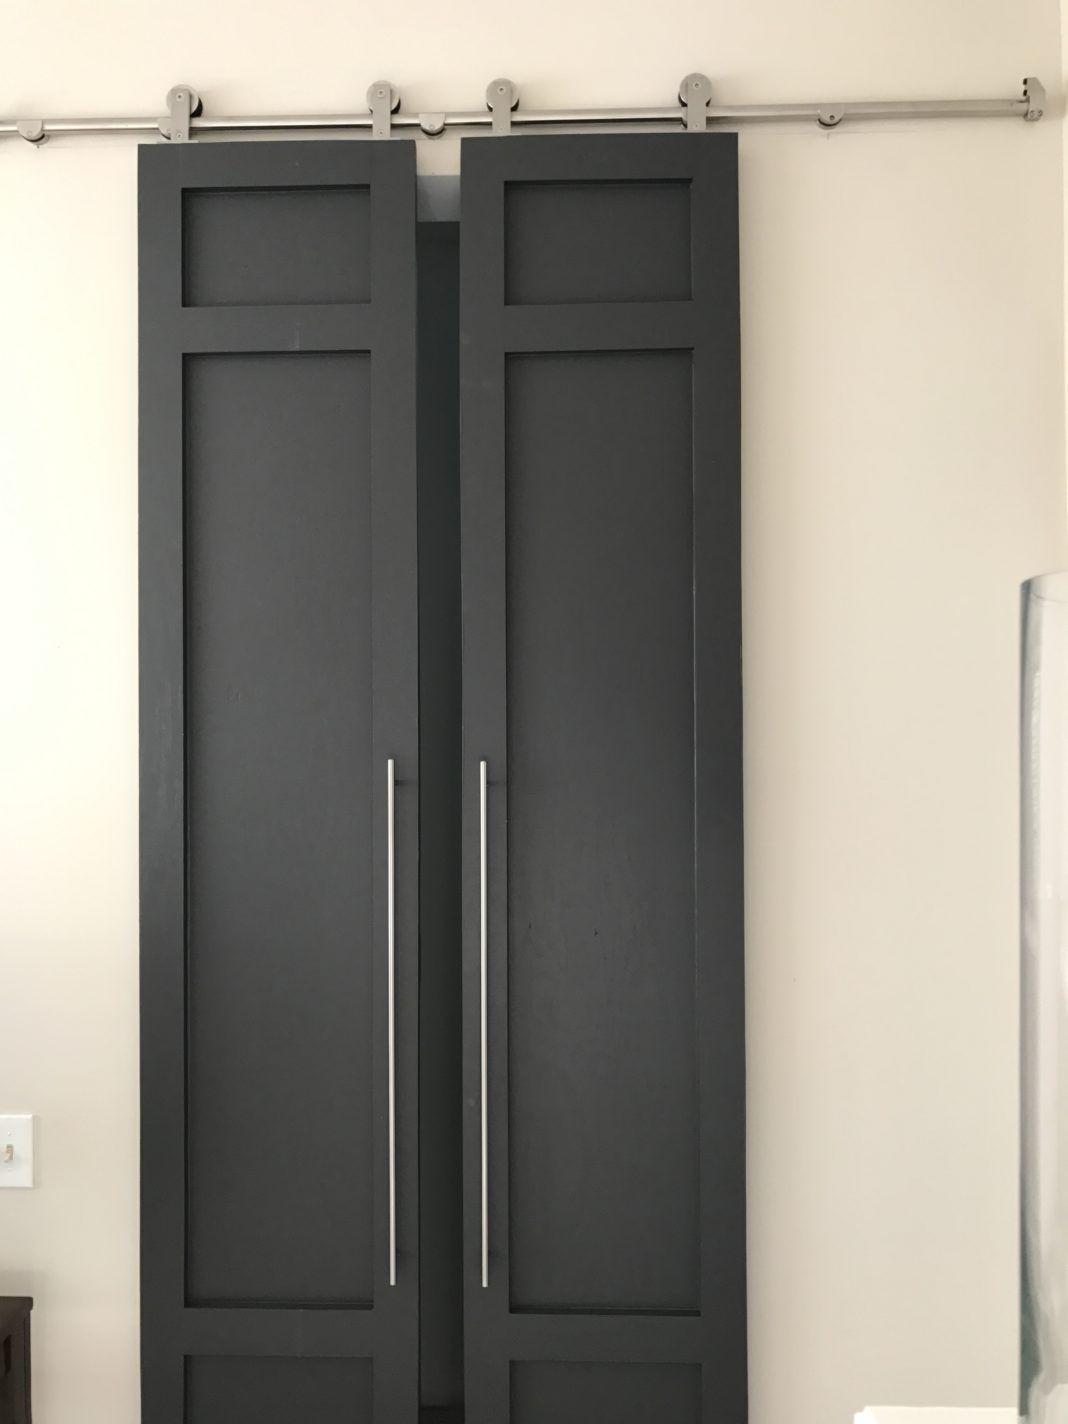 Diy Modern Style Tall Sliding Barn Doors With Pulls Part 2 Deco Combles Idee Salle De Bain Et Decoration Condo